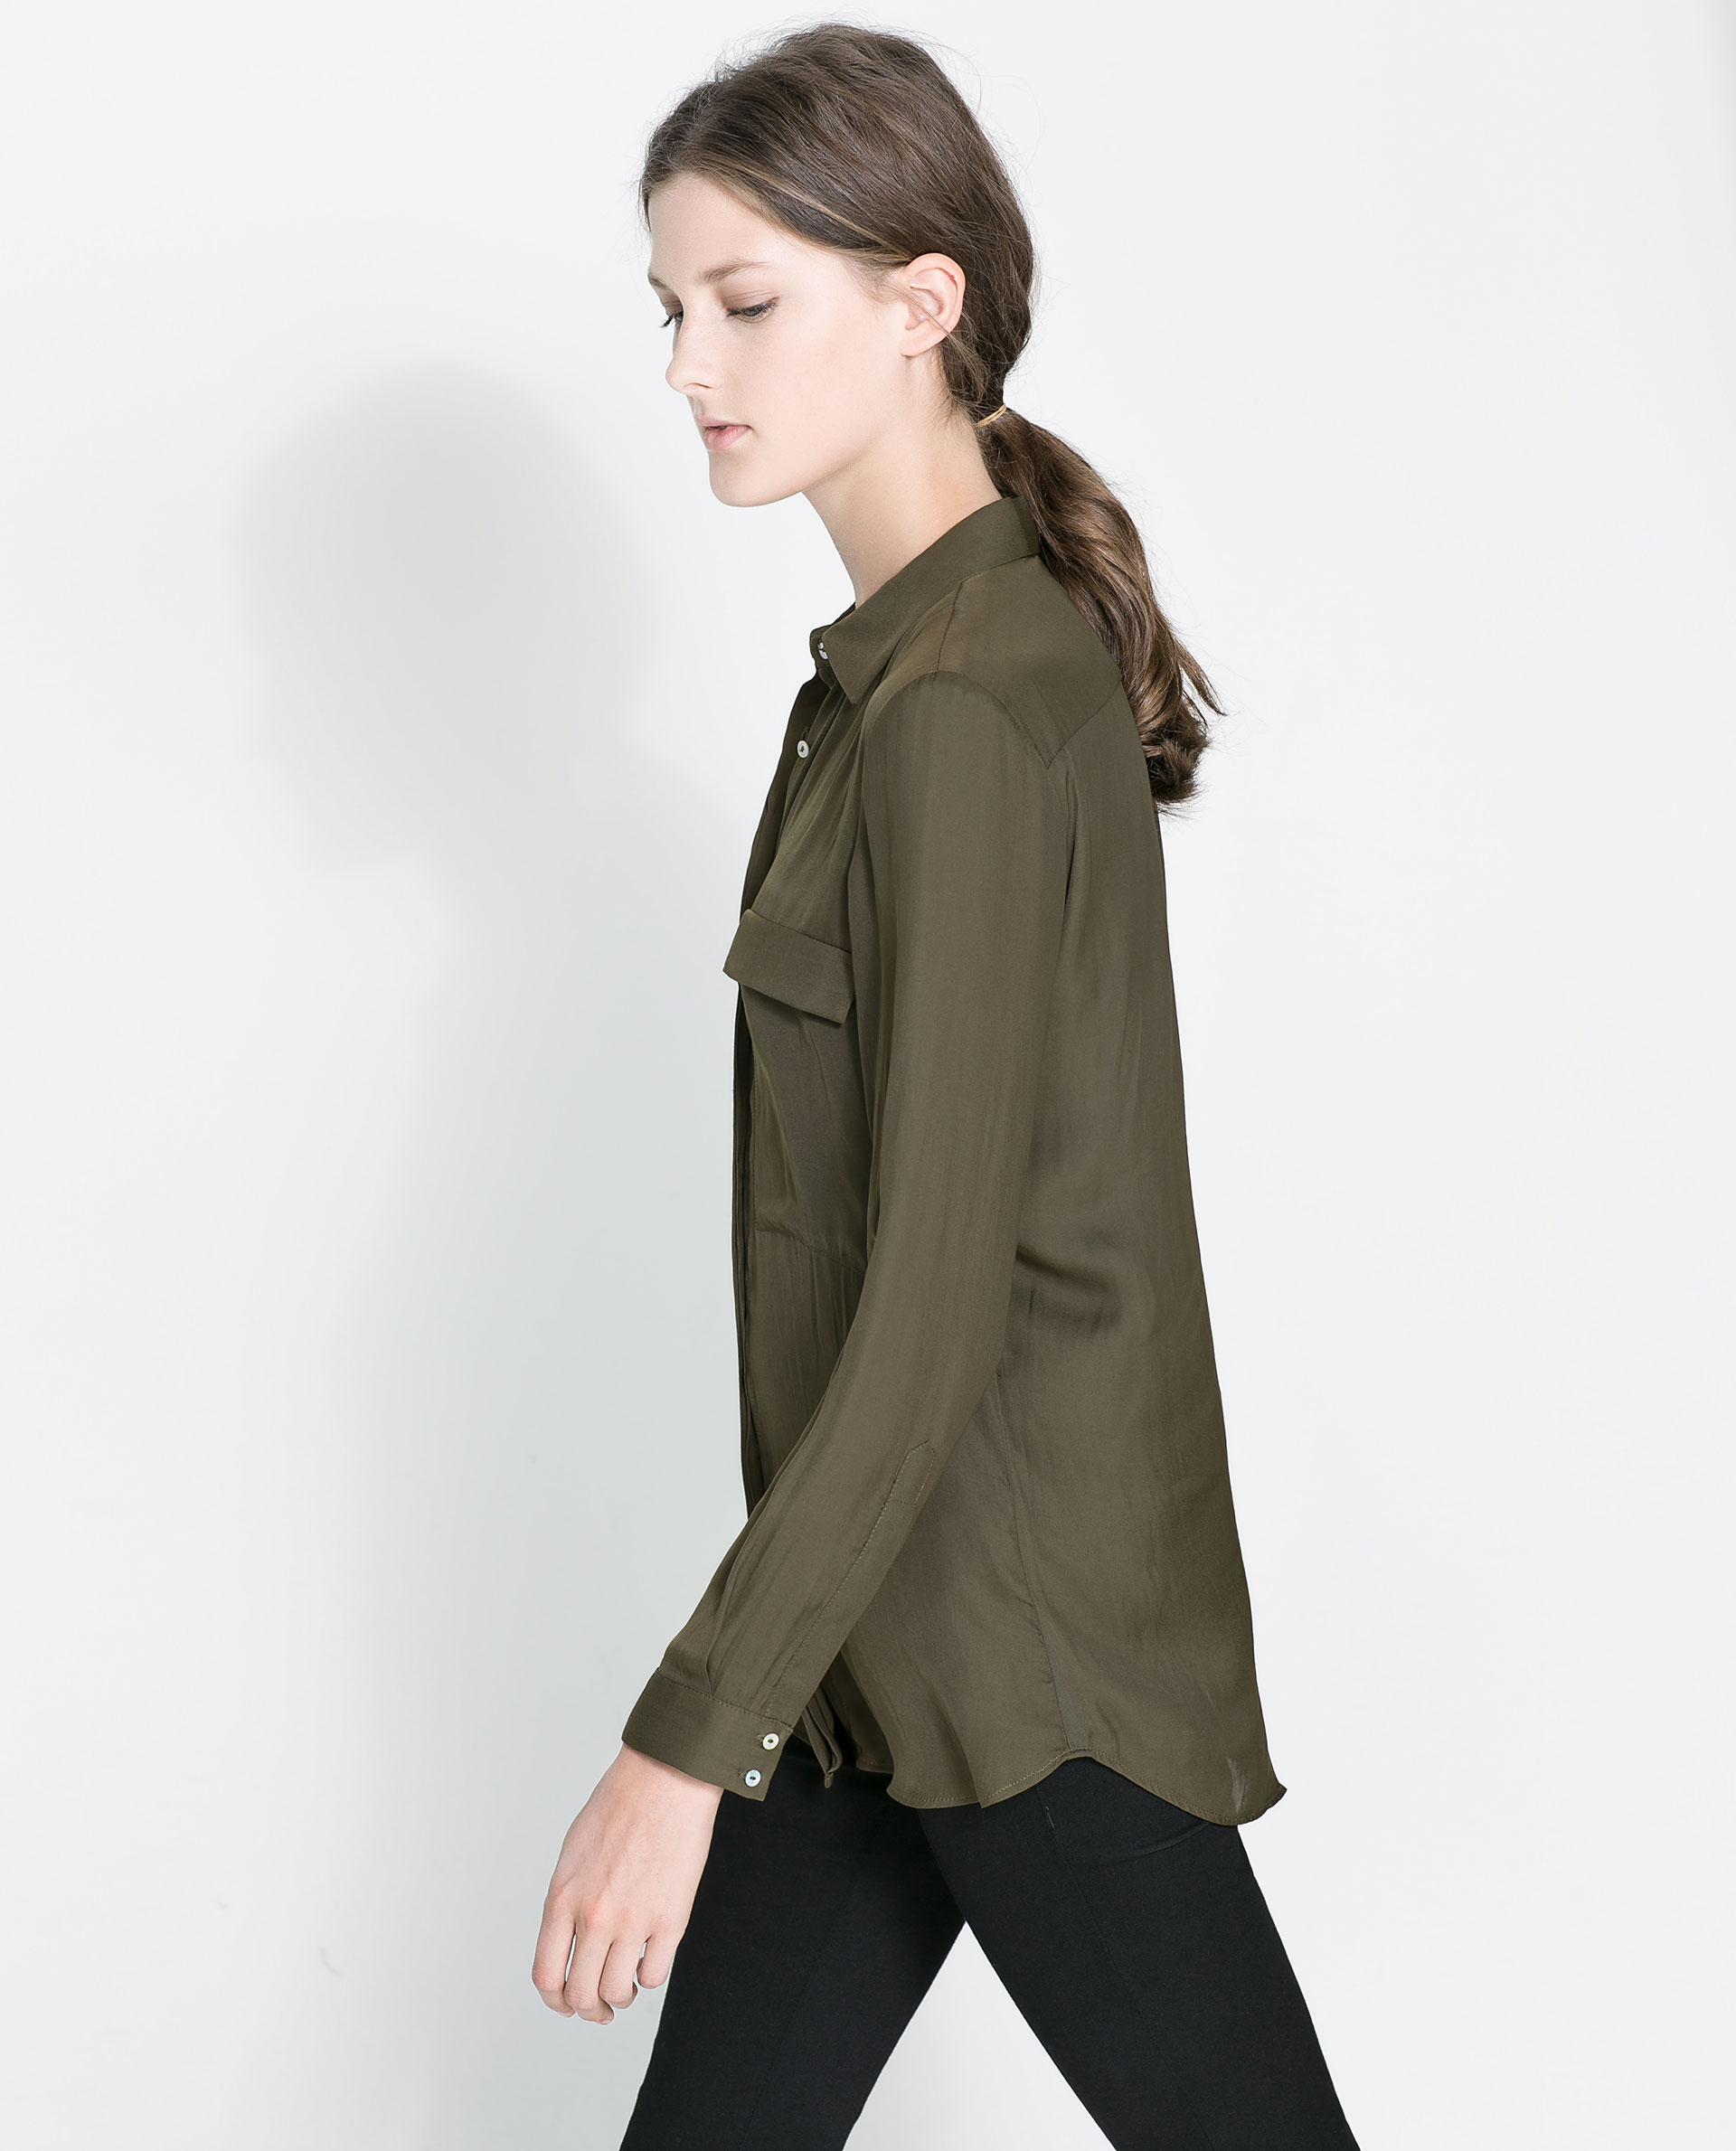 Zara Shirt Style Blouse 54